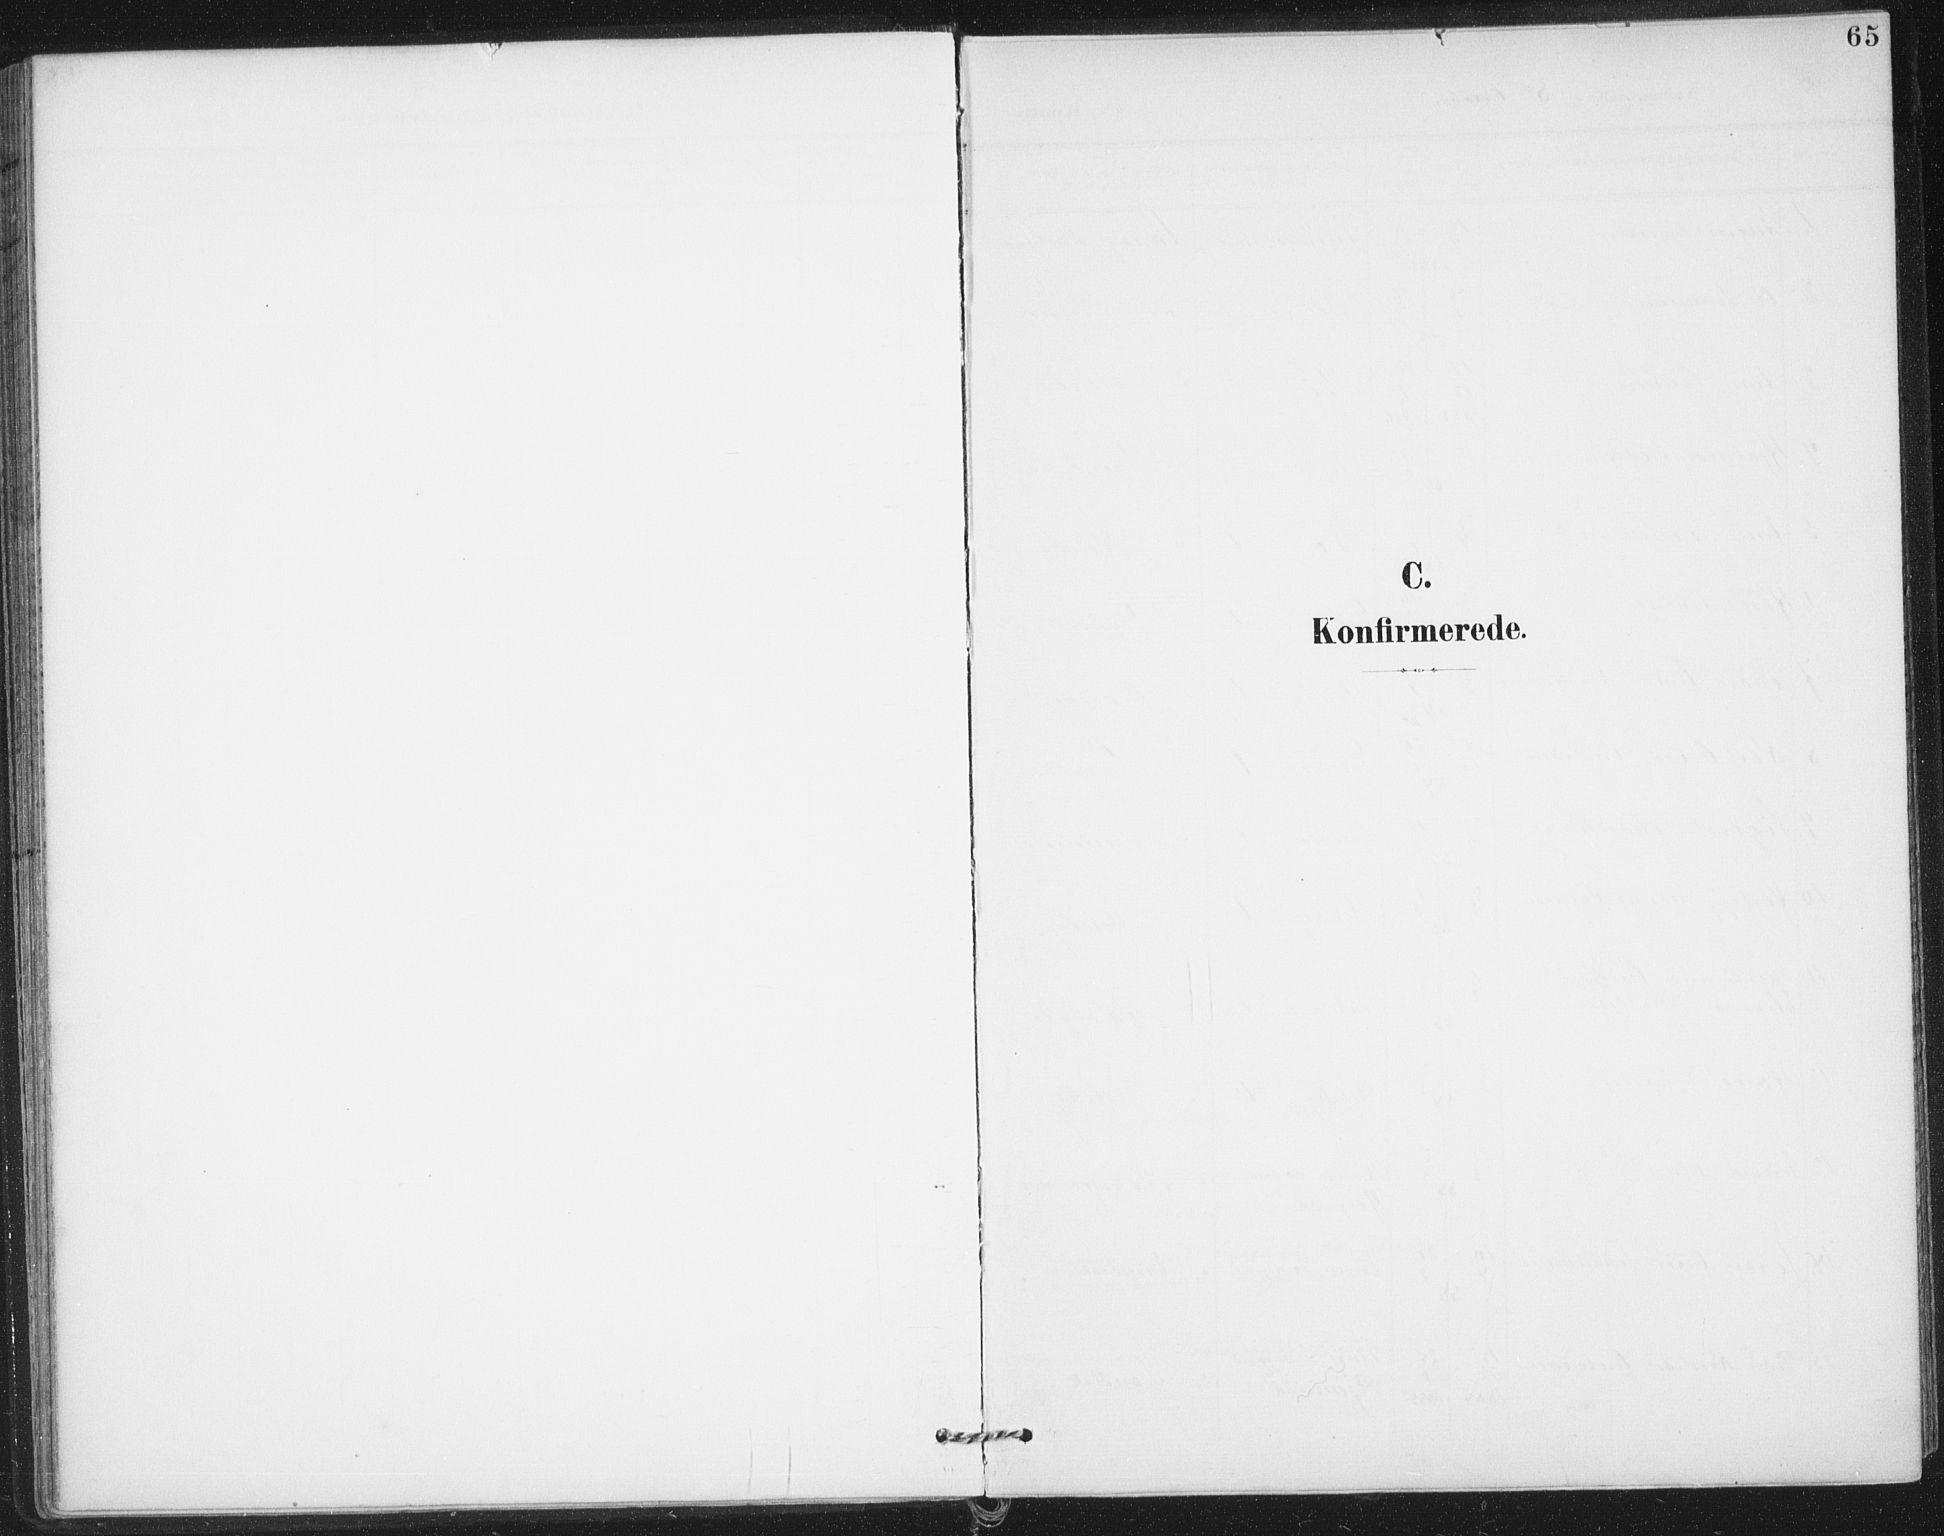 SAO, Varteig prestekontor Kirkebøker, F/Fa/L0003: Parish register (official) no. 3, 1899-1919, p. 65